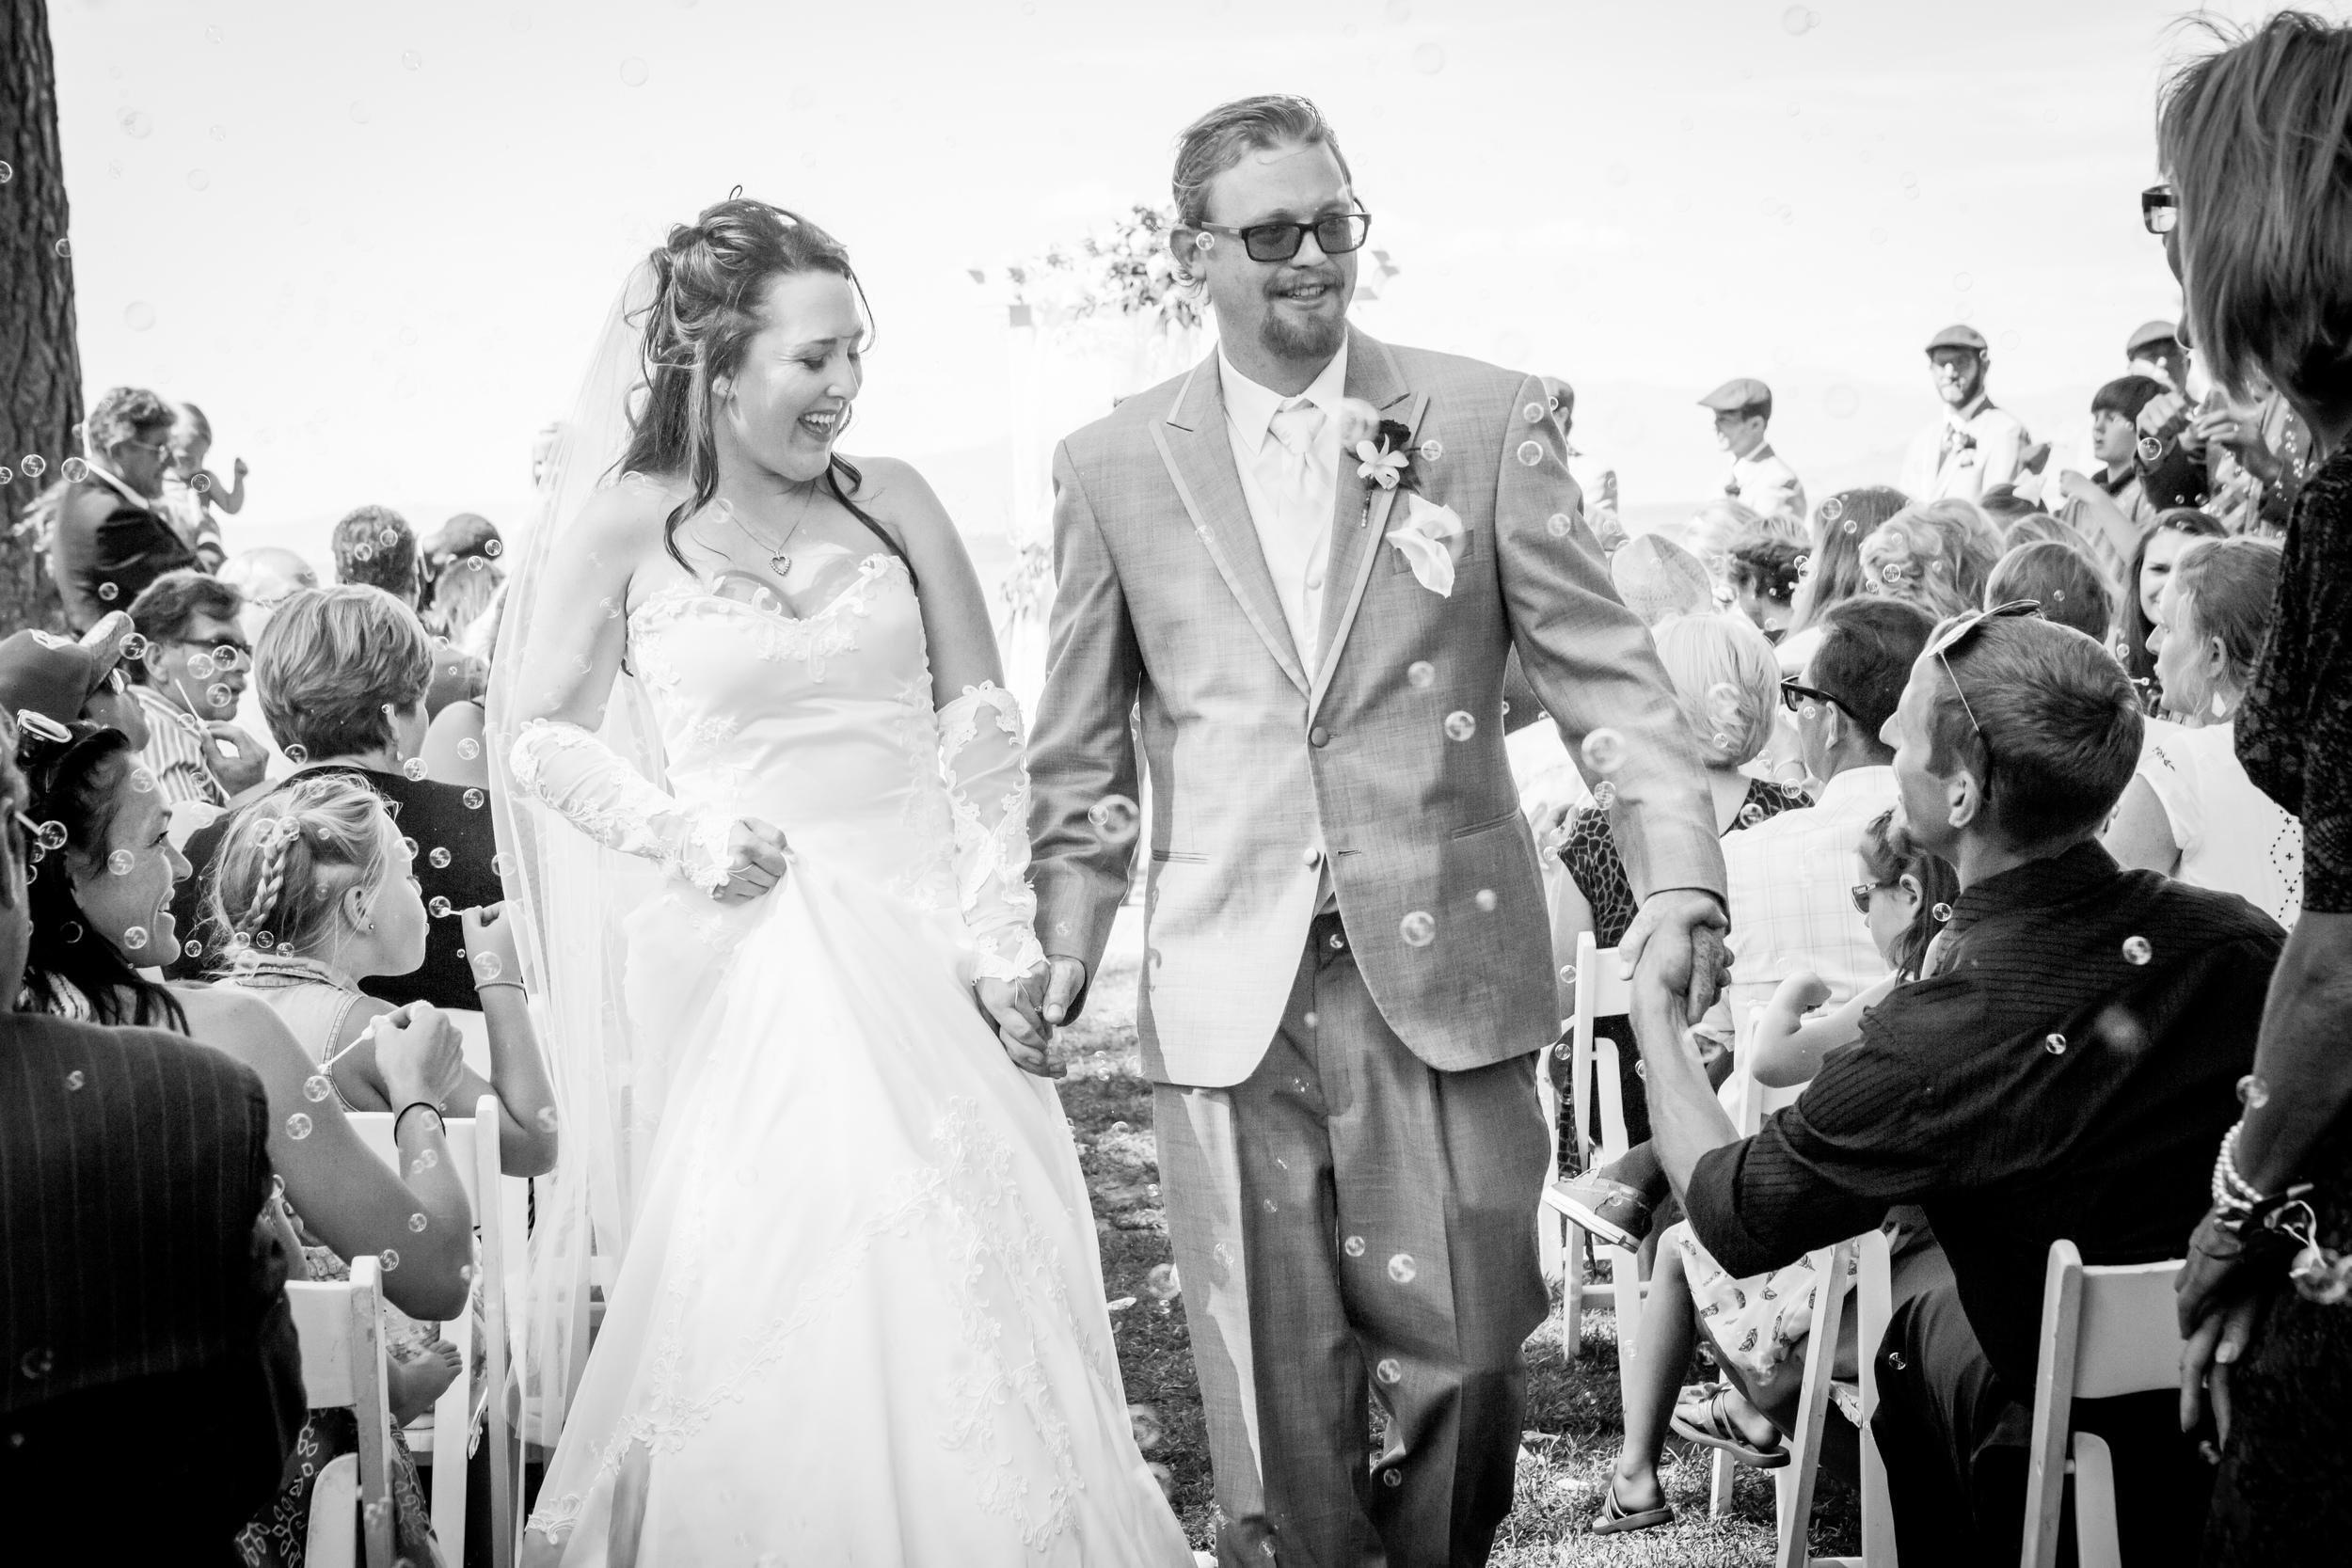 Merhaut_Wedding_2014_199-2.jpg